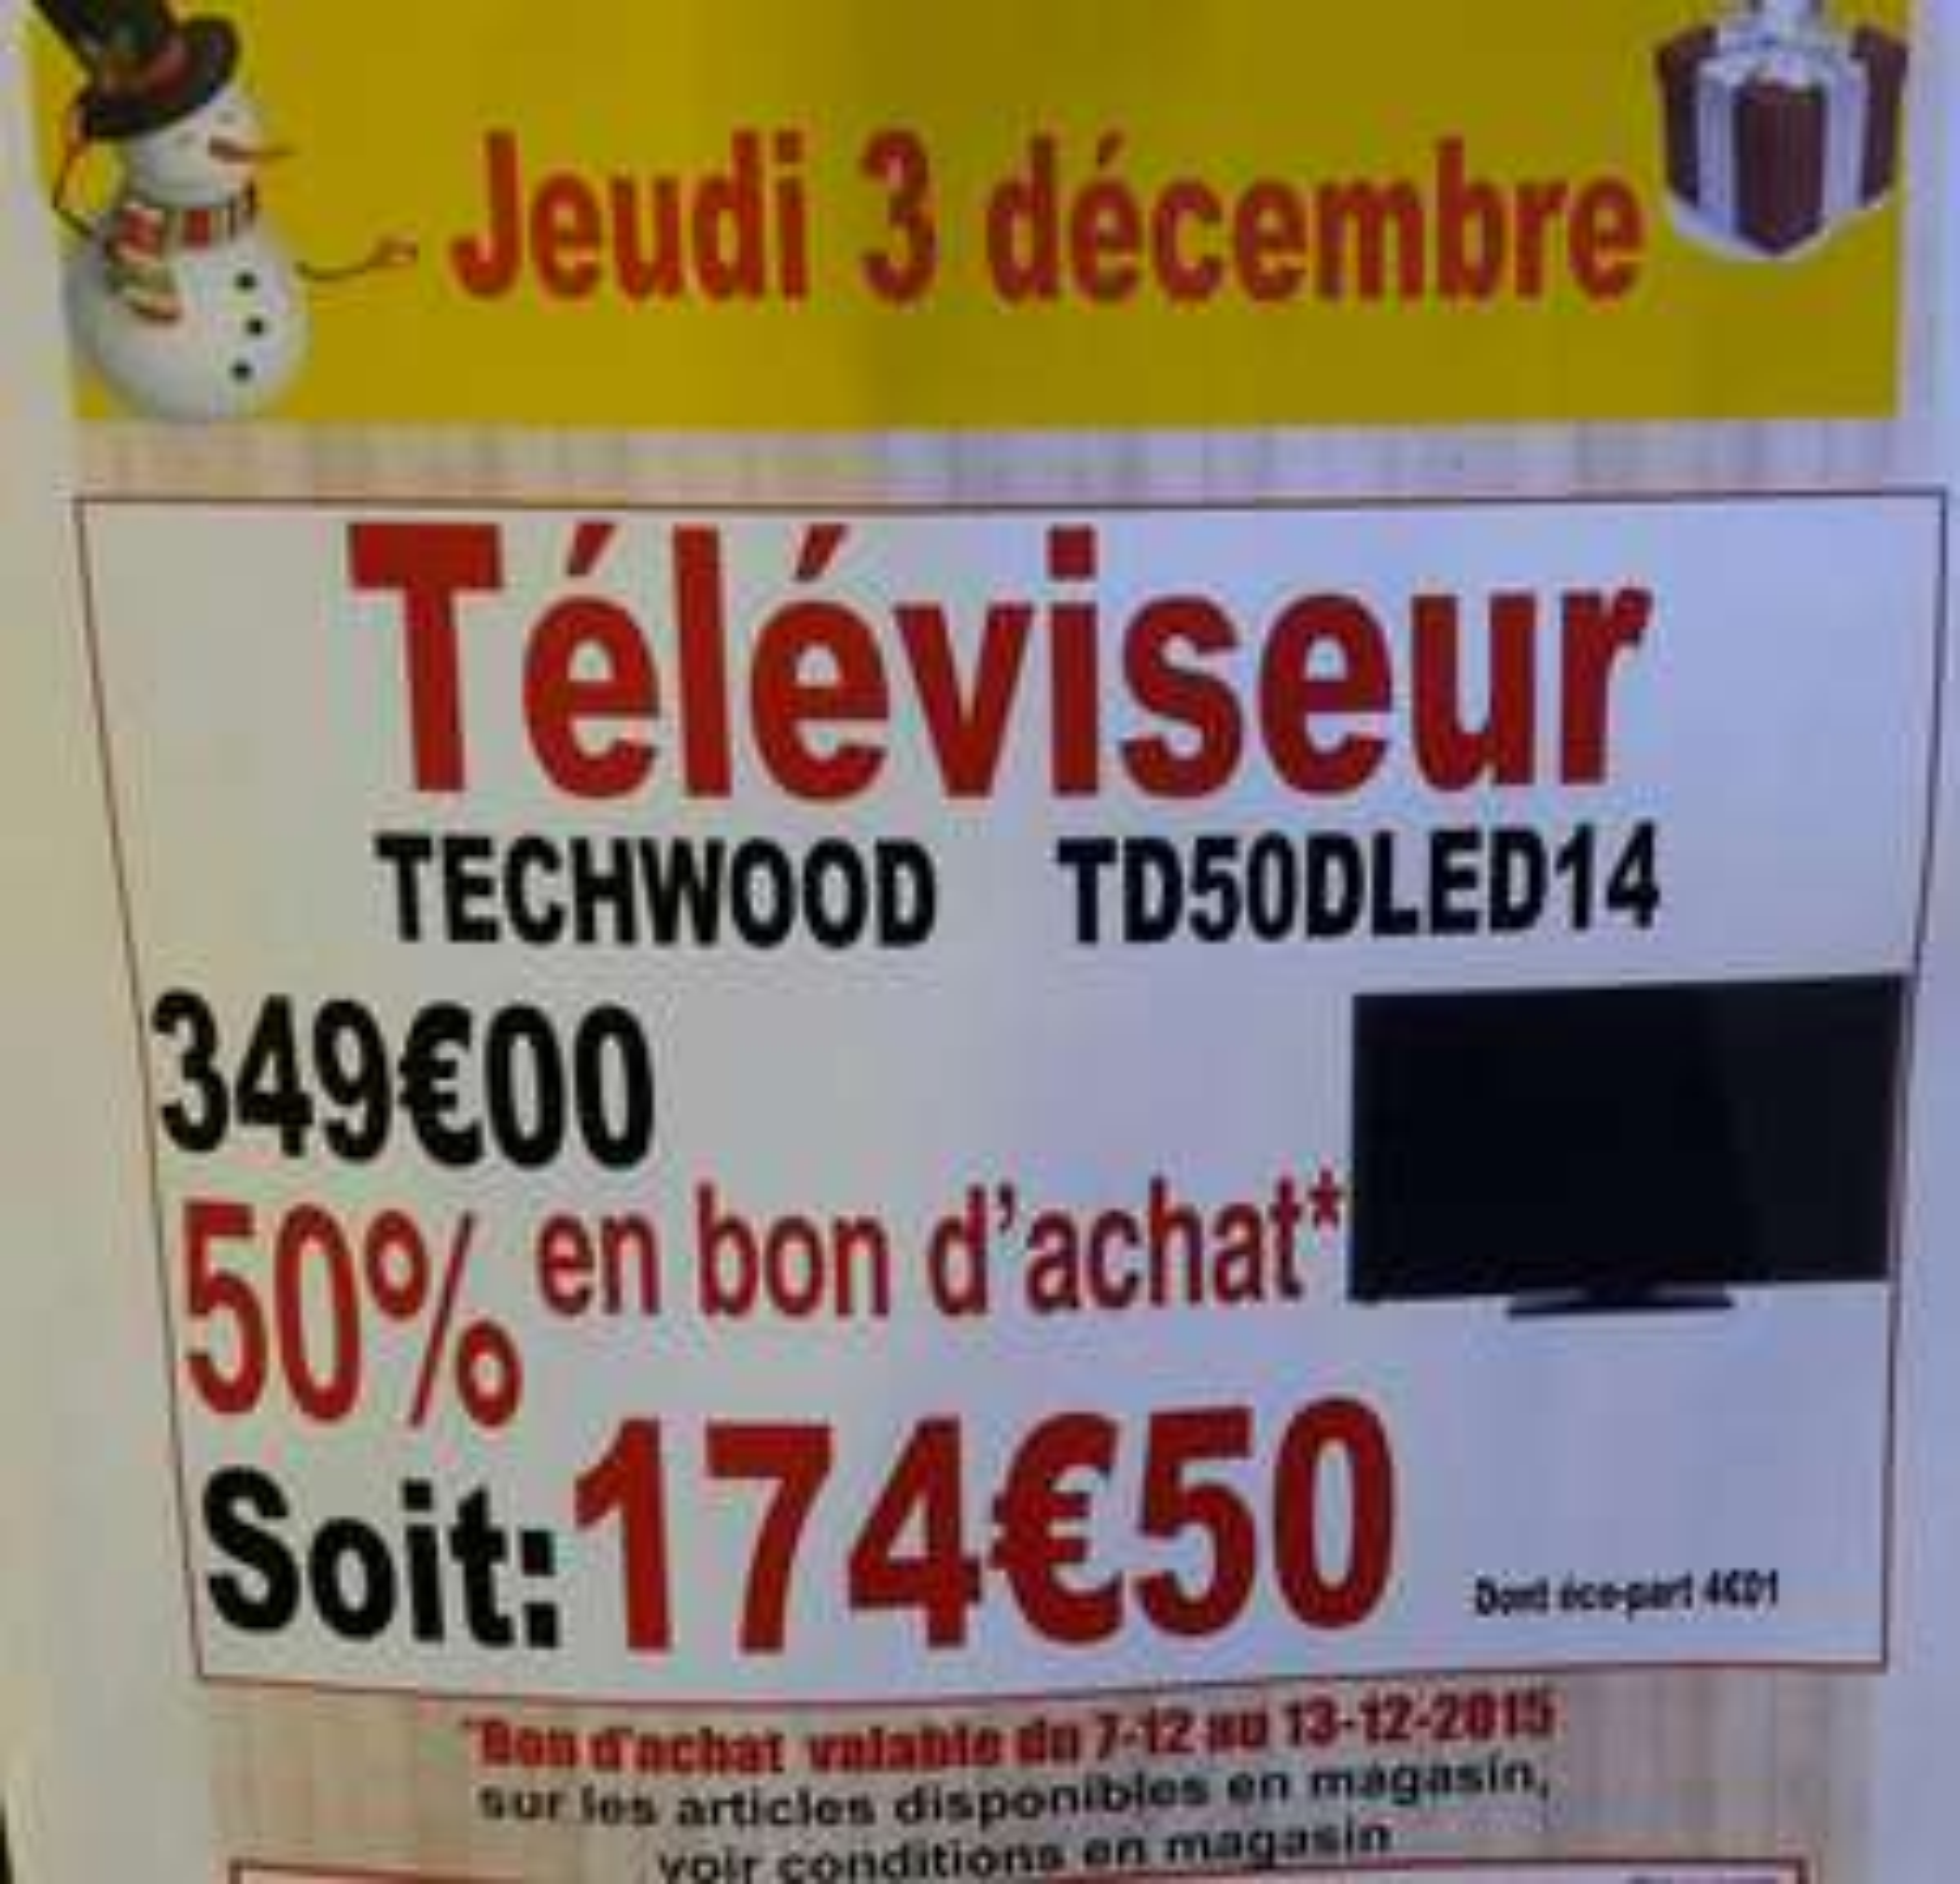 "TV 50"" Techwood TD50DLED14 (avec 174,50€ en bon d'achat)"